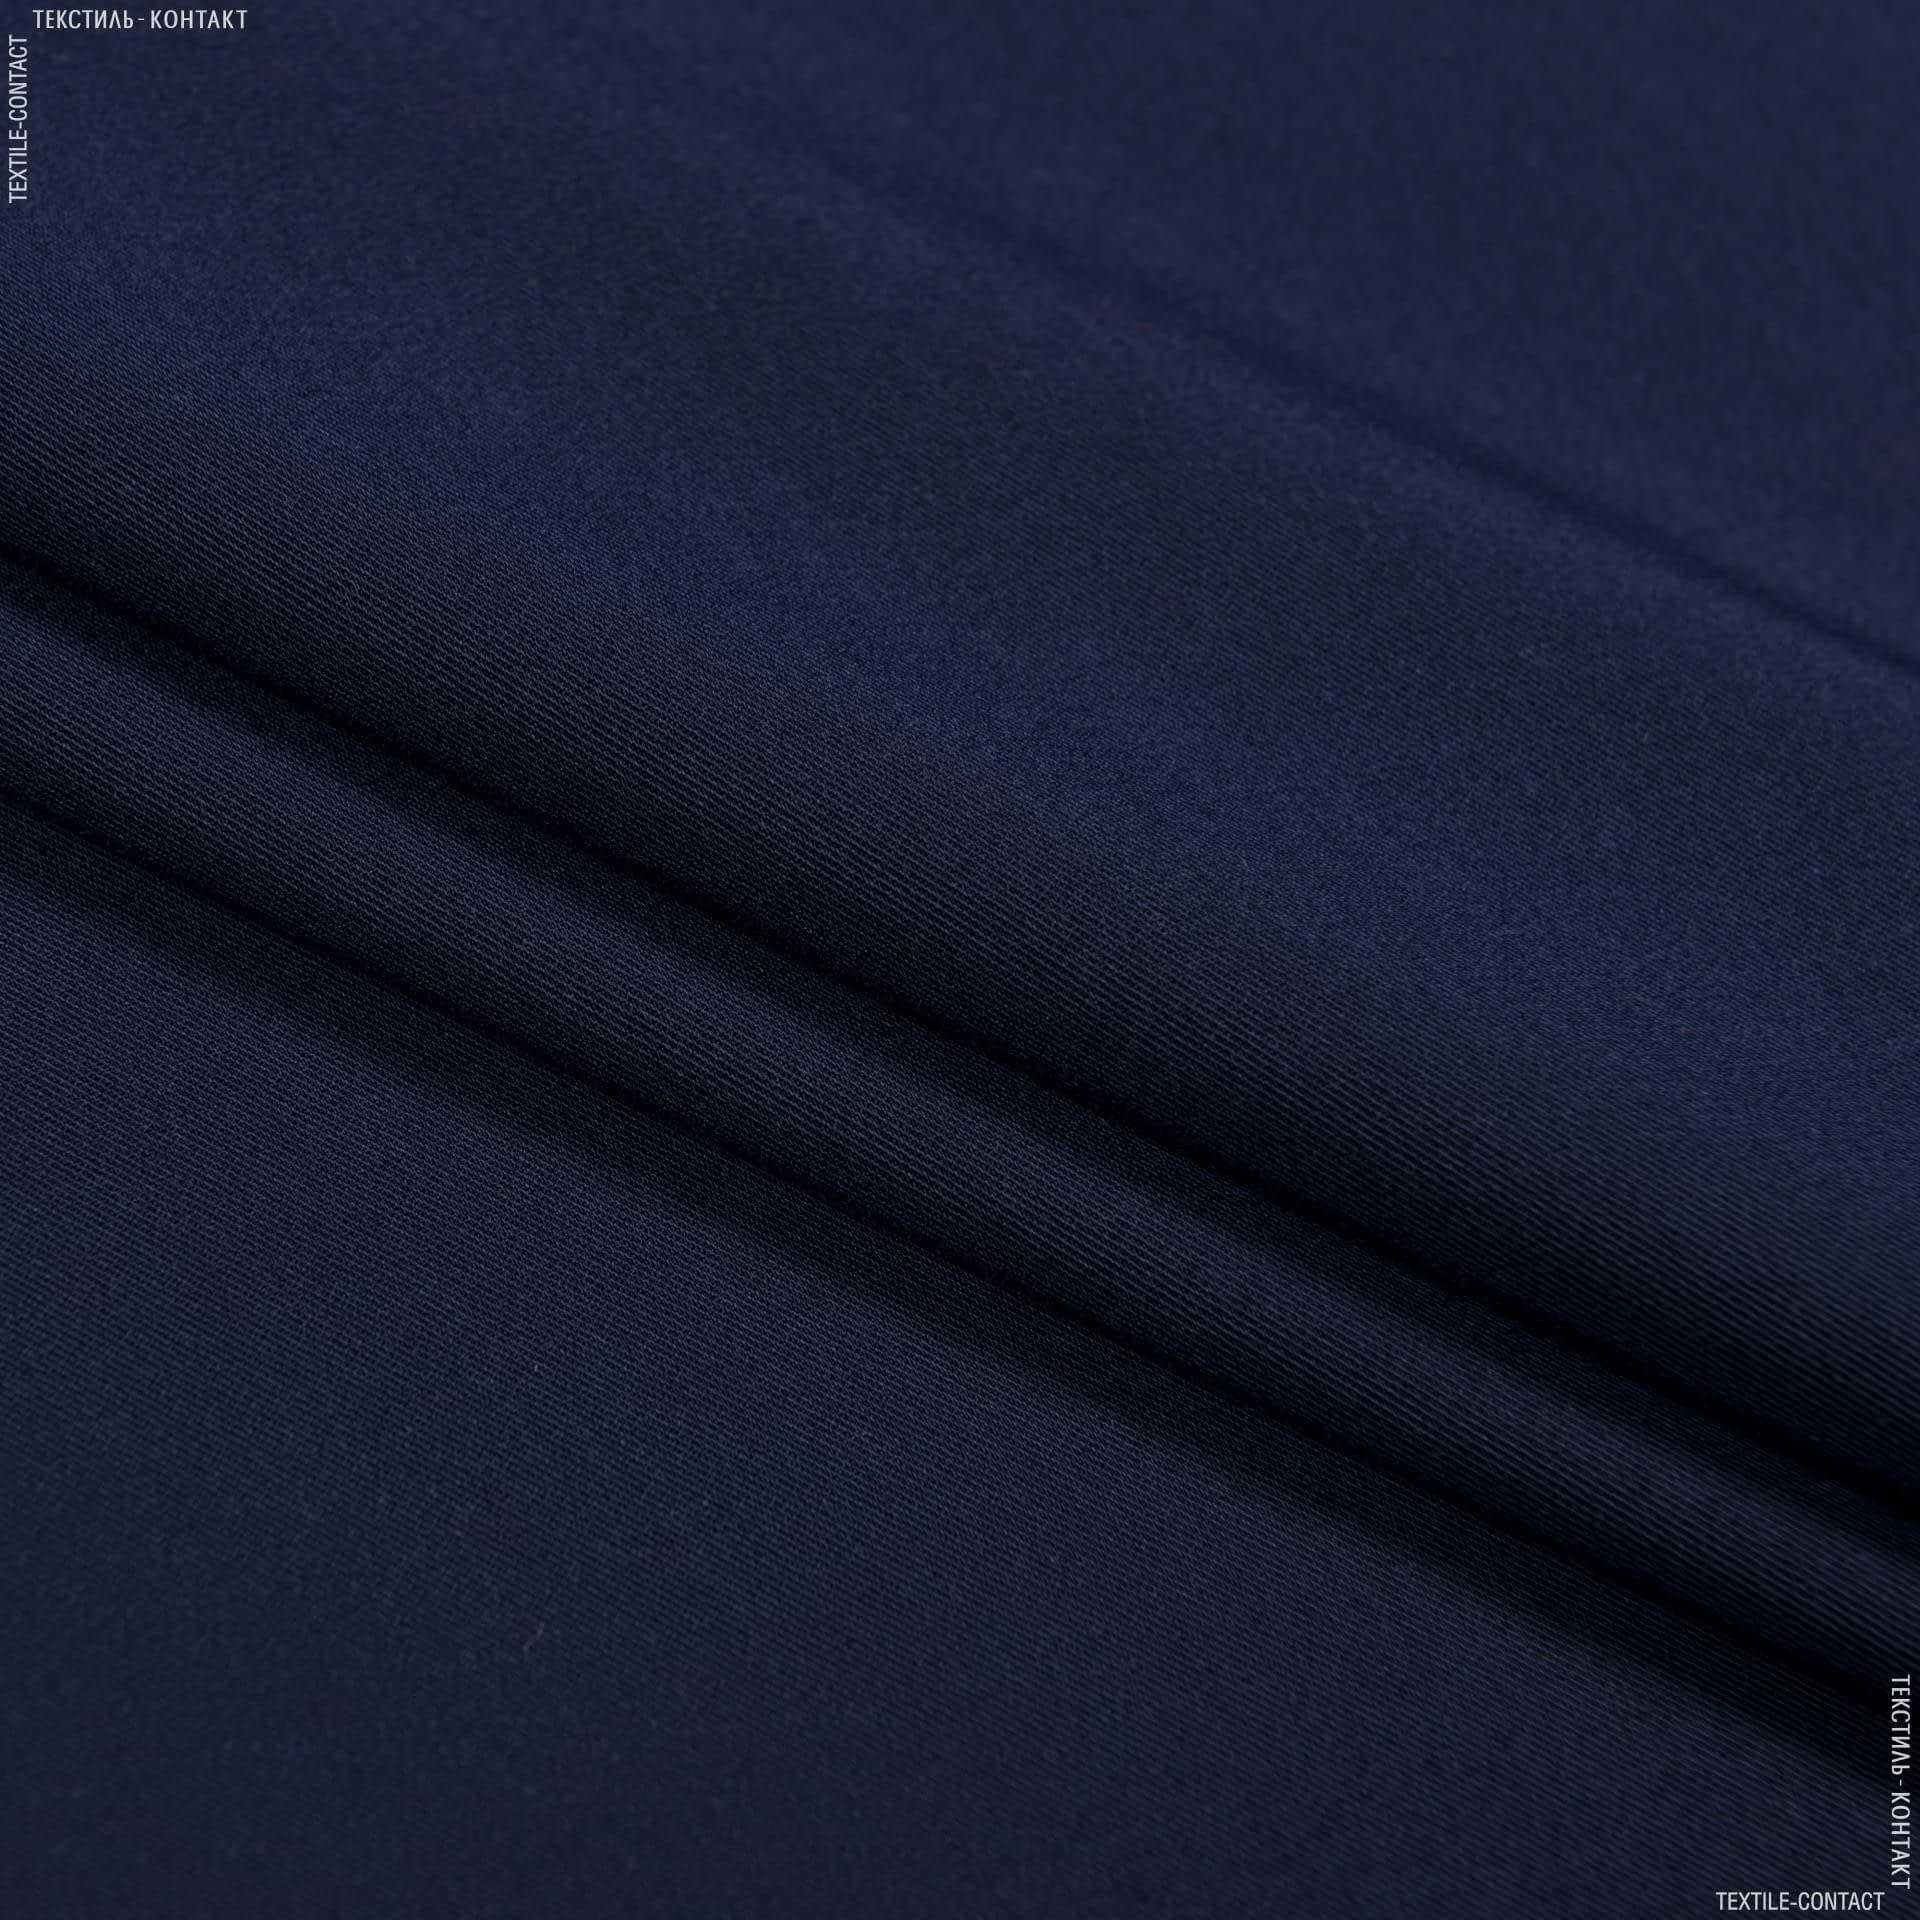 Ткани для костюмов - Костюмная тесла темно-синий